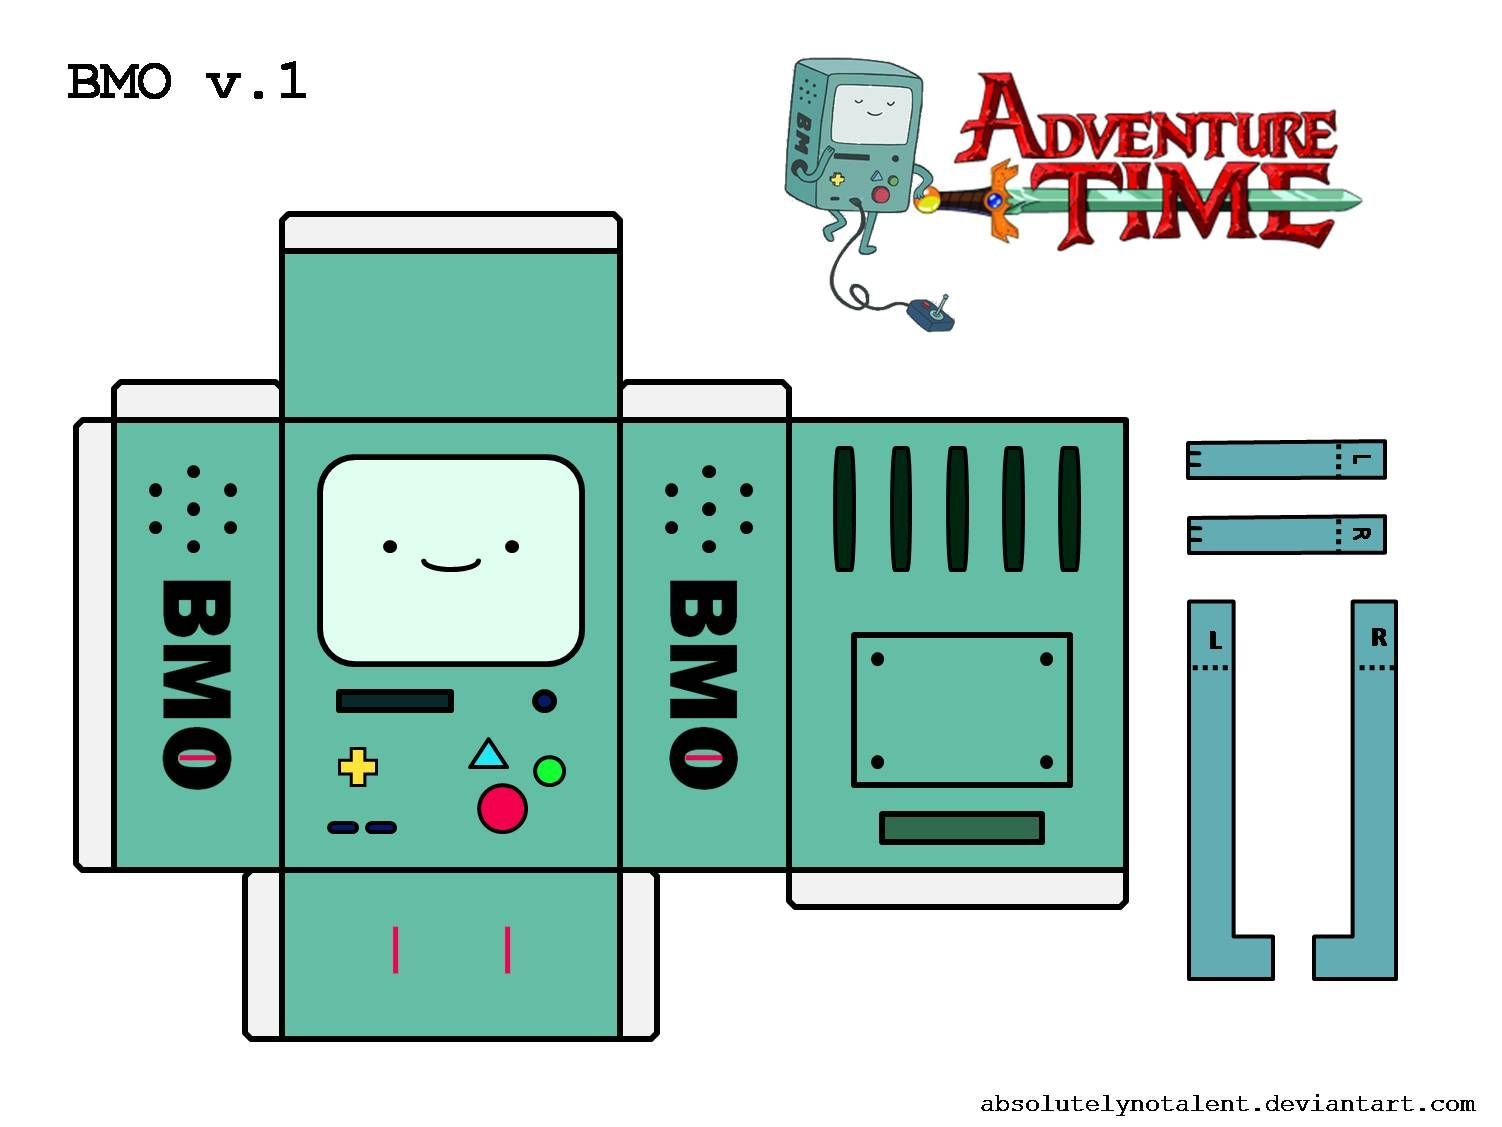 Muito Bonecos 3D Hora de Aventura 2 | Boneco 3d, Aventura e 3d ZF71